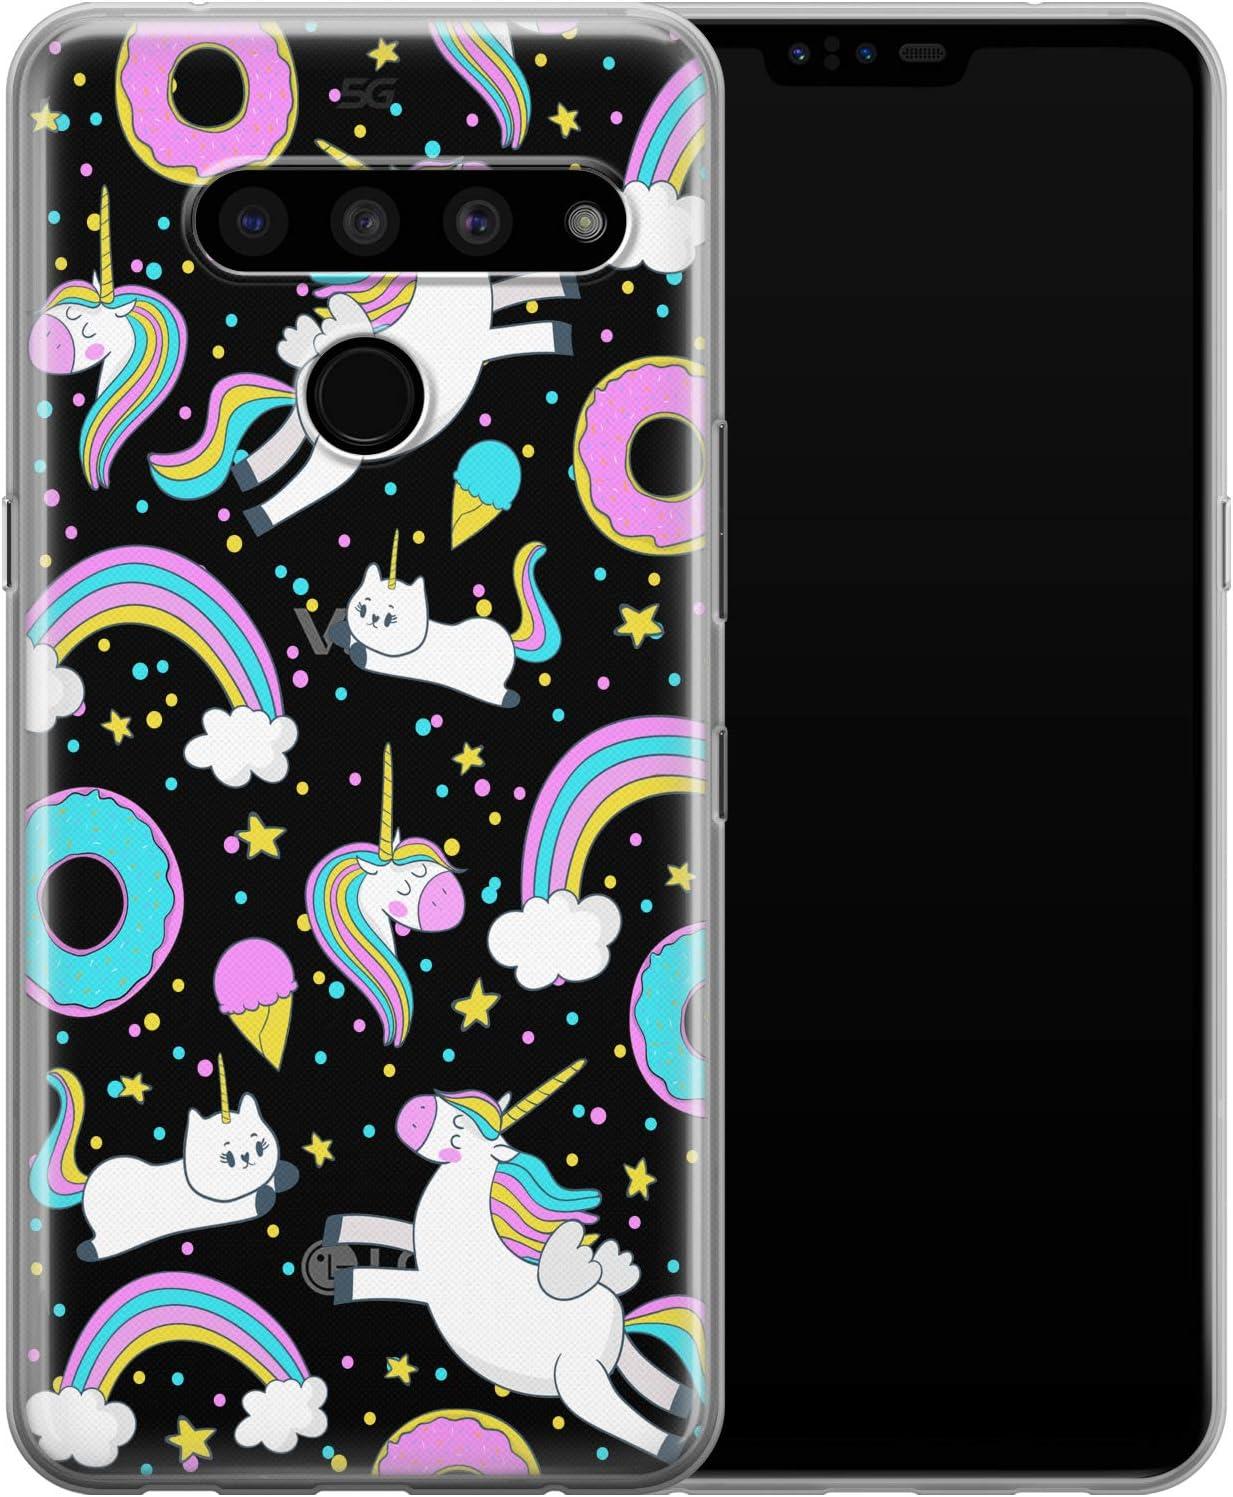 Vonna Phone Case Replacement for LG G8 ThinQ G7 G6 Velvet 5G V50 V40 V35 V30 Plus V20 Smooth Food Donut Girls Blue Soft Silicone Cutie Pink Print Ice Cream Design Flexible Cover Unicorn Teen a002